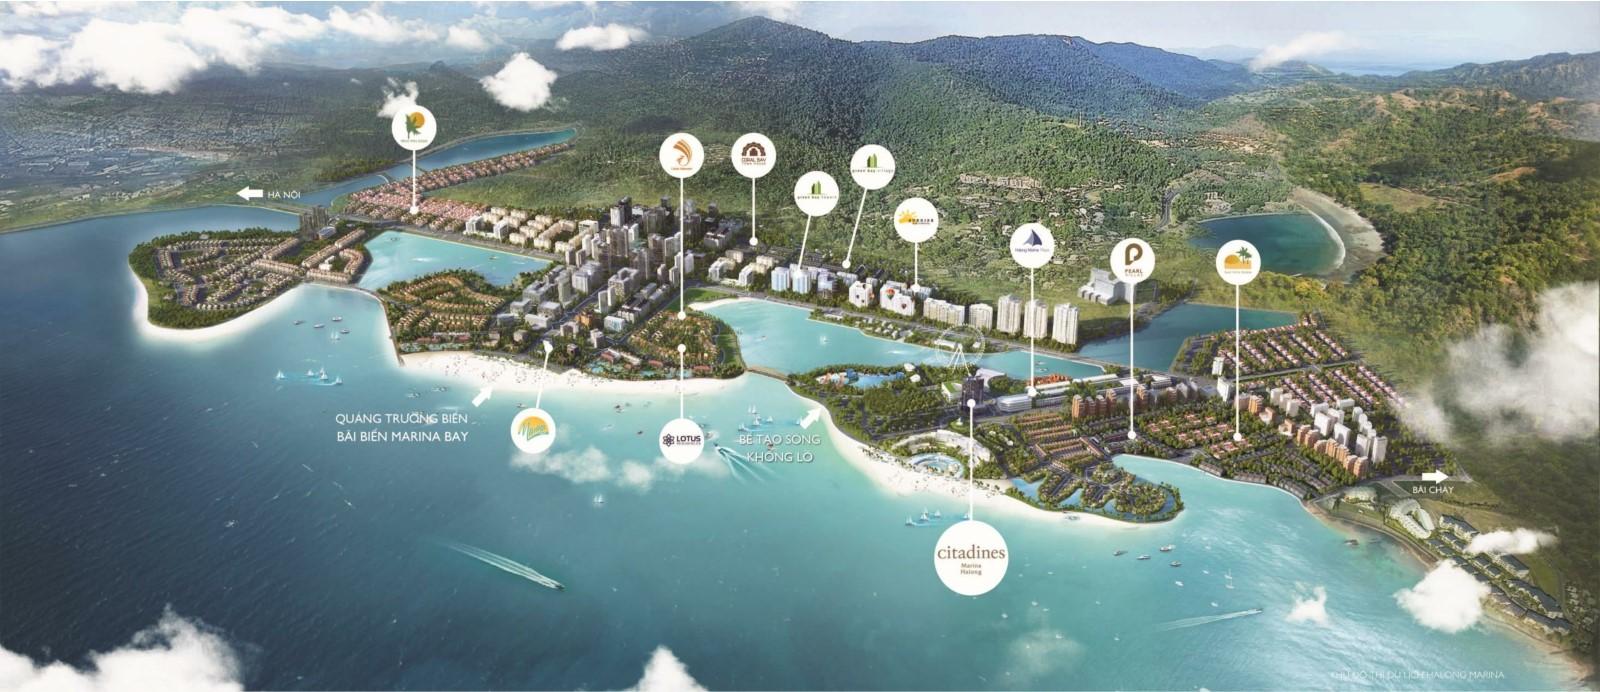 vị trí dự án citadines